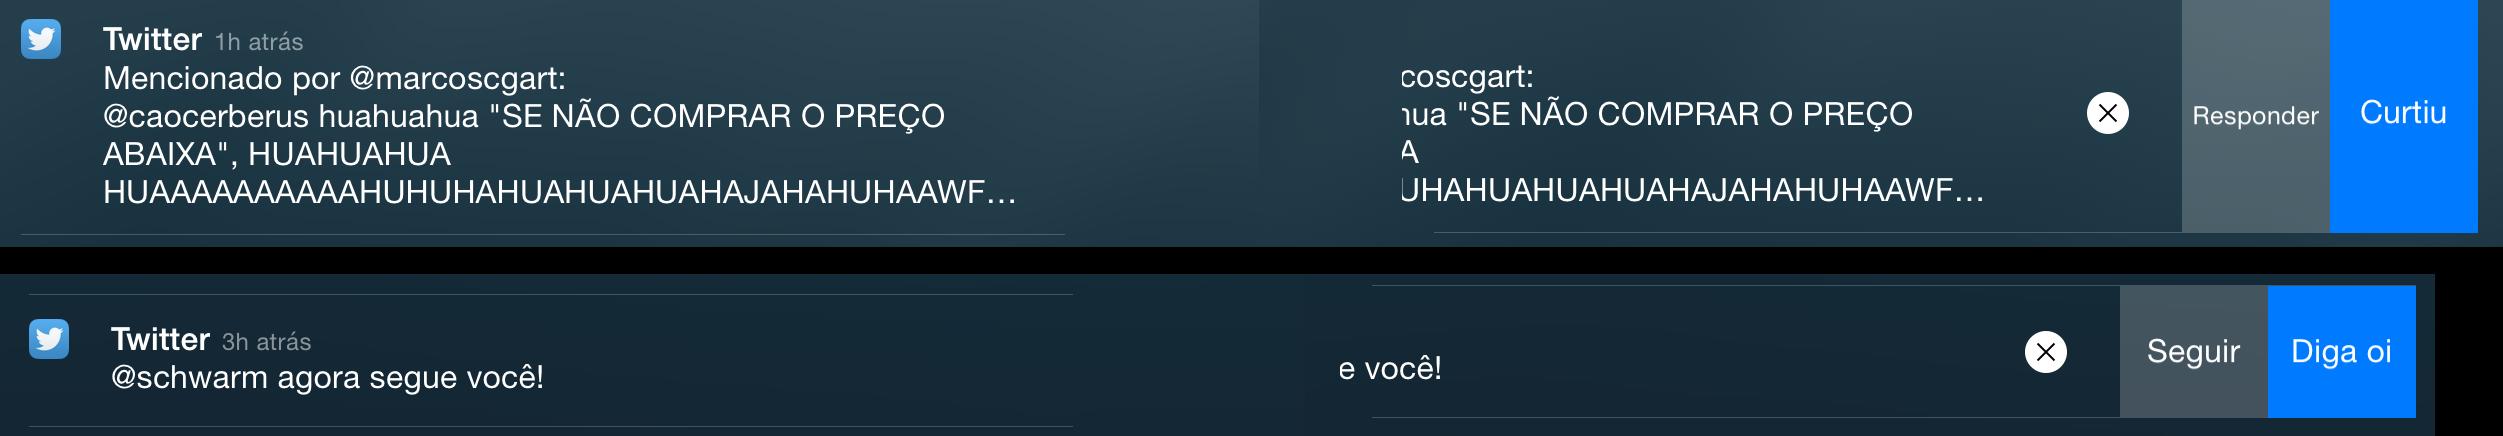 twitter-ja-conta-com-notificacao-interativa